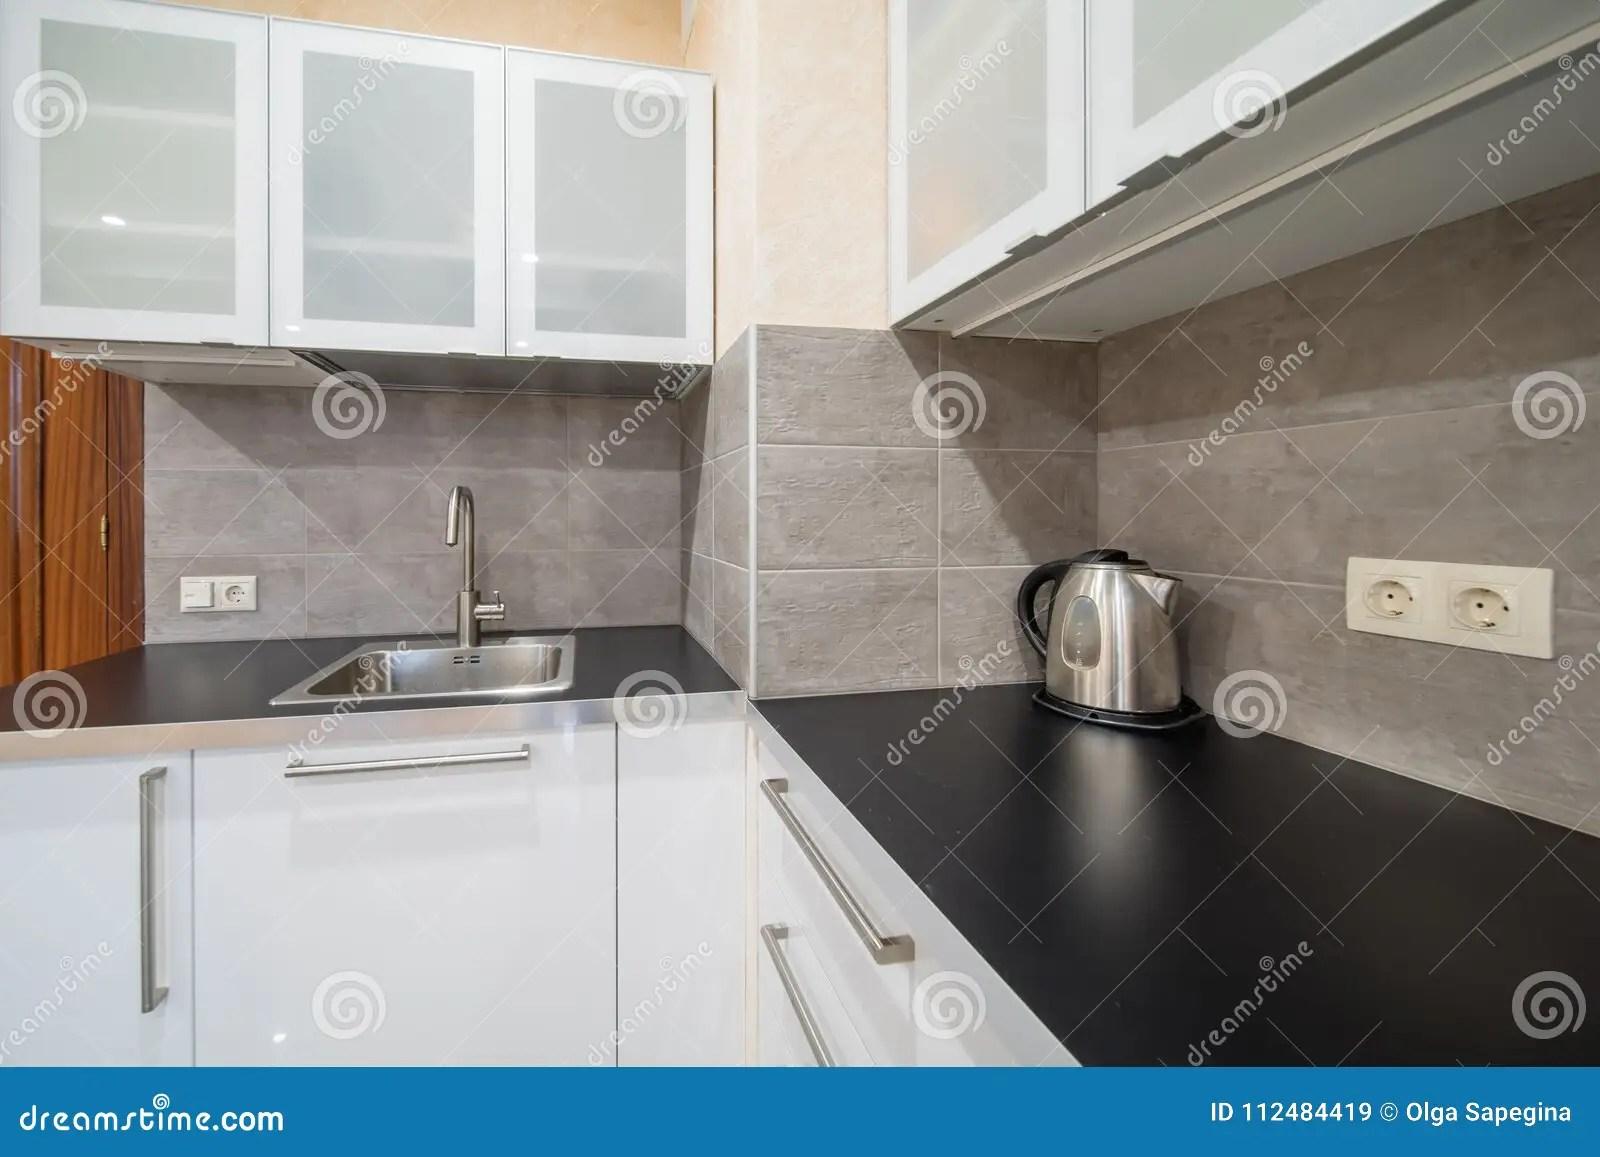 in stock kitchens kitchen cabinet shelves 现代厨房工作台面库存图片 图片包括有水壶 次幂 室内 内部 不锈 倒空与水槽和水壶的现代厨房工作台面